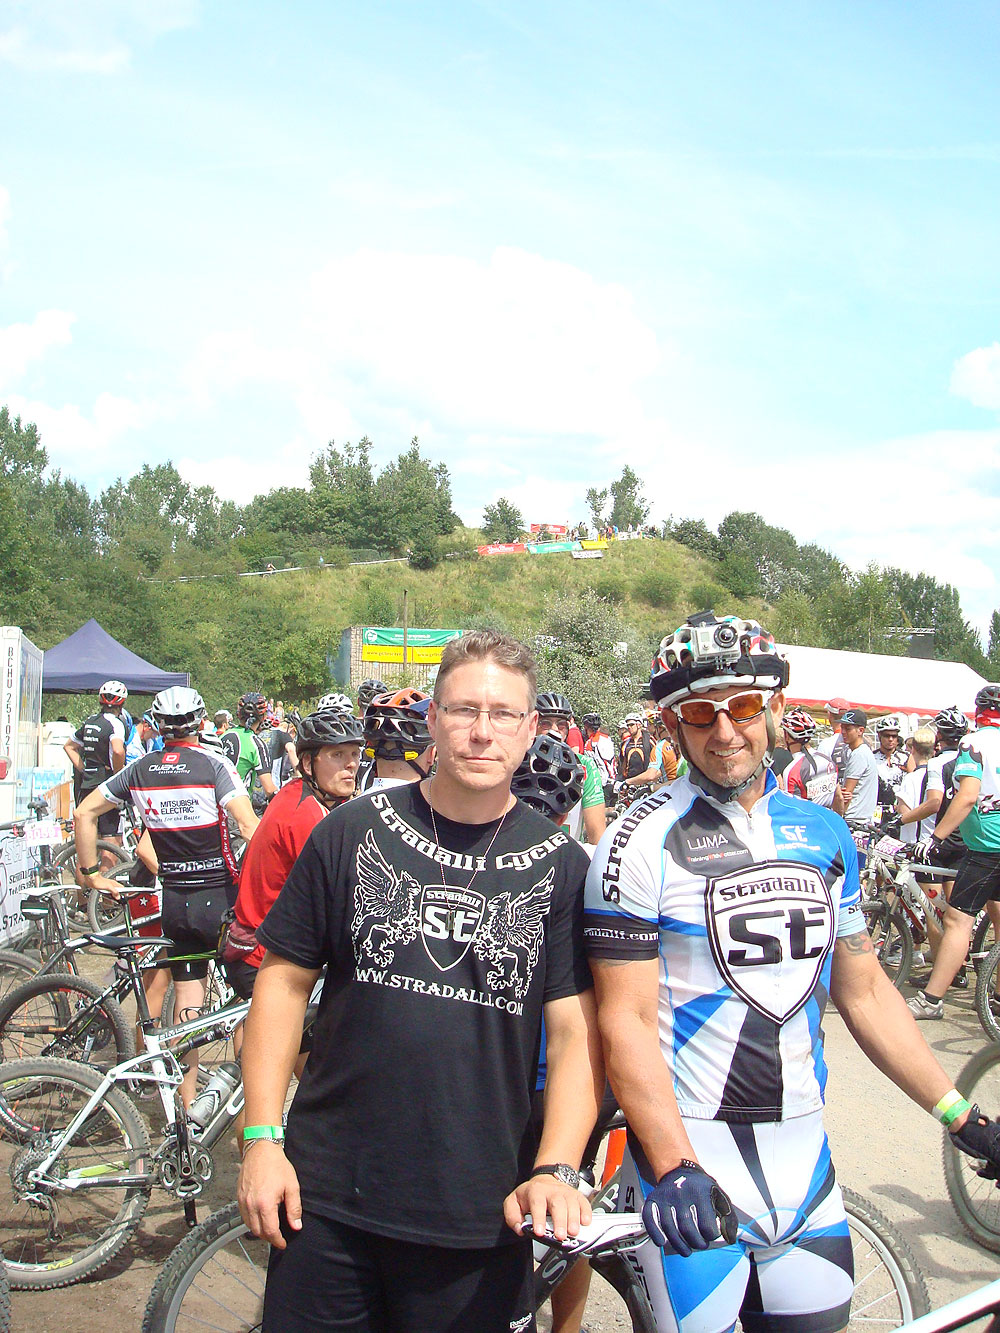 team_stradalli_mtb_races_grant_potter_axel.jpg